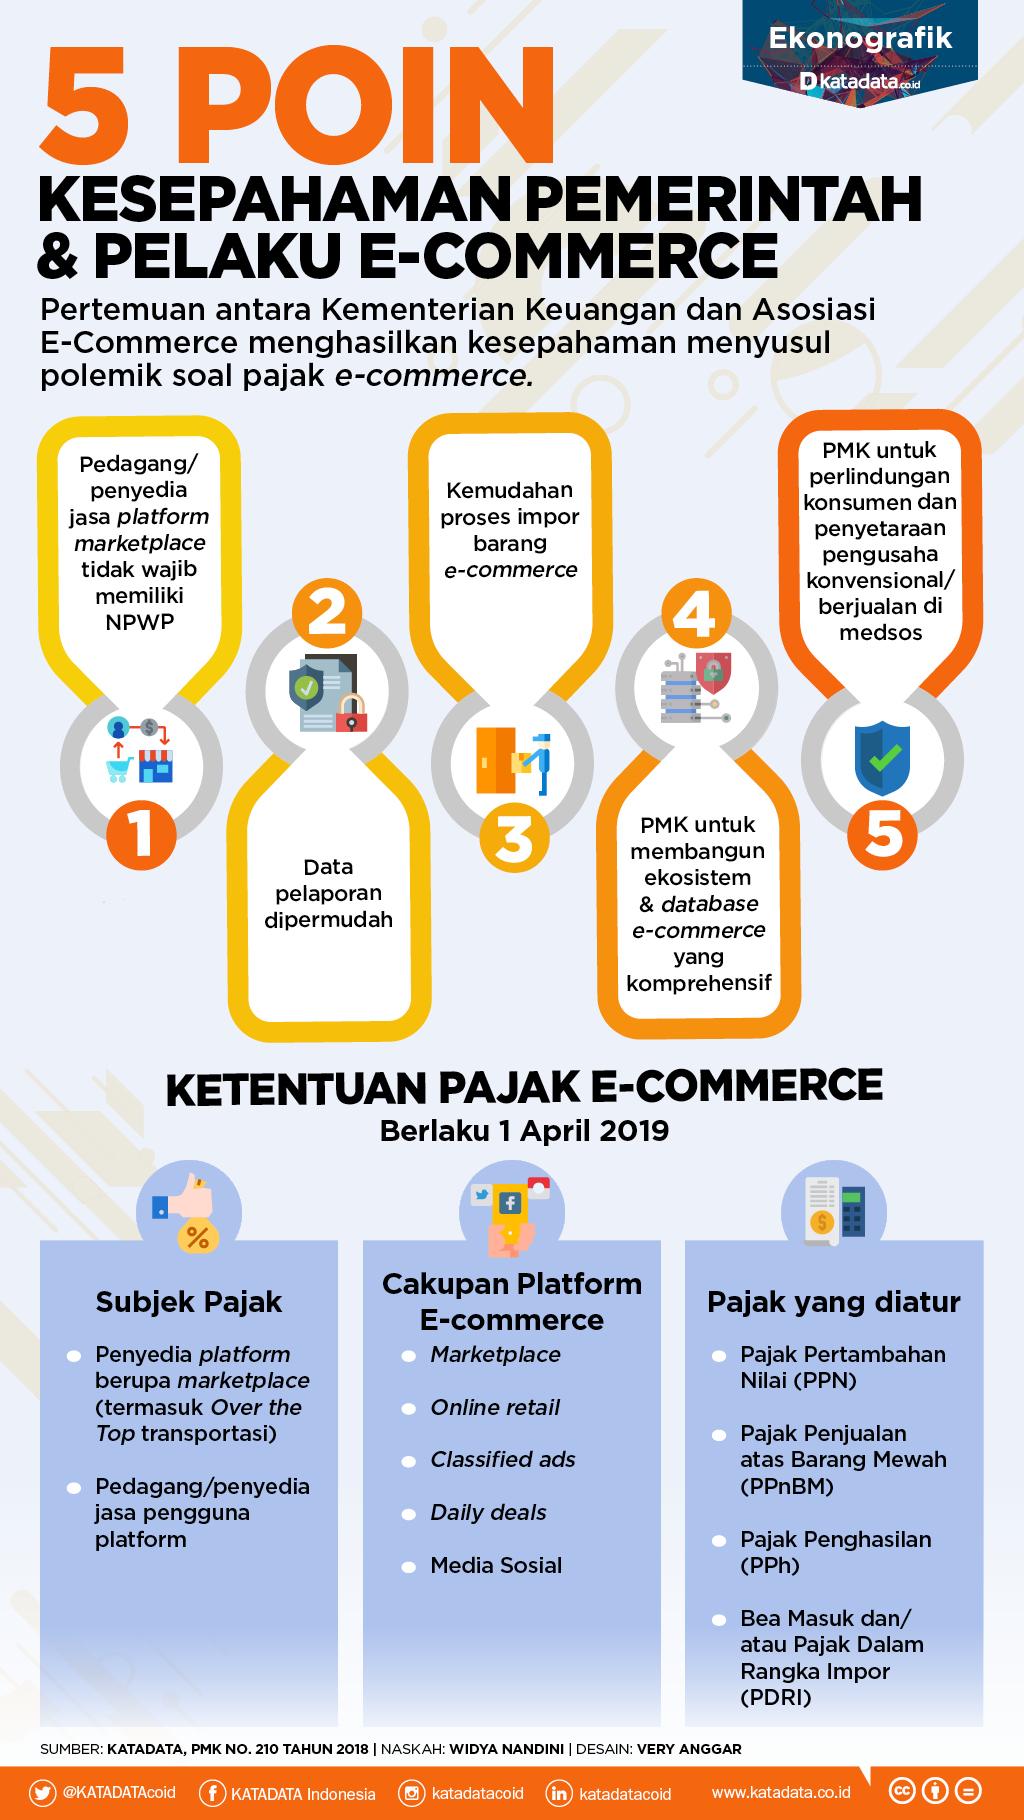 5 Poin Kesepahaman Pemerintah & Pelaku E-commerce